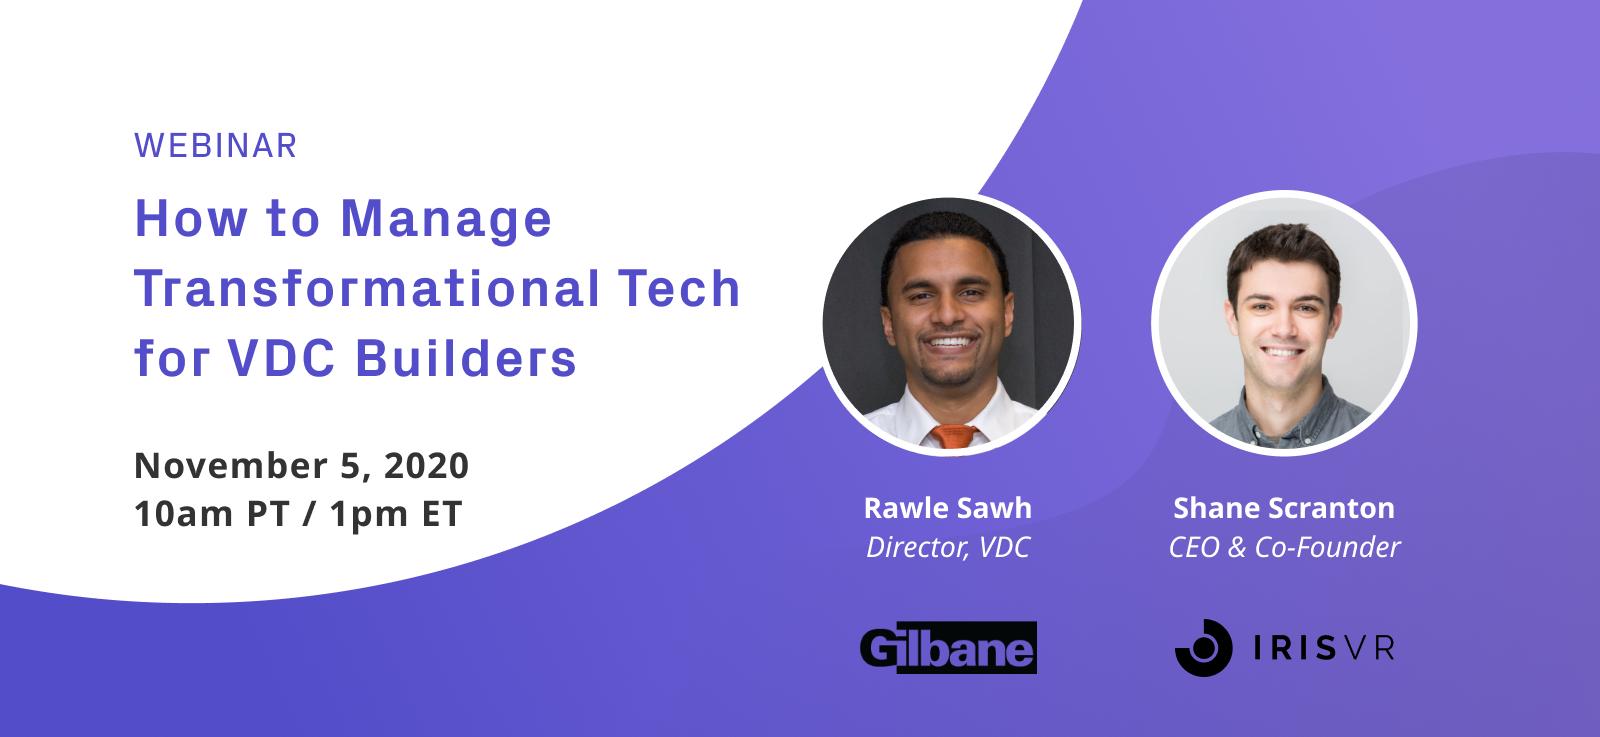 IrisVR-Webinar-2020_Manage-Transformational-Tech-VDC-Builders_Gilbane